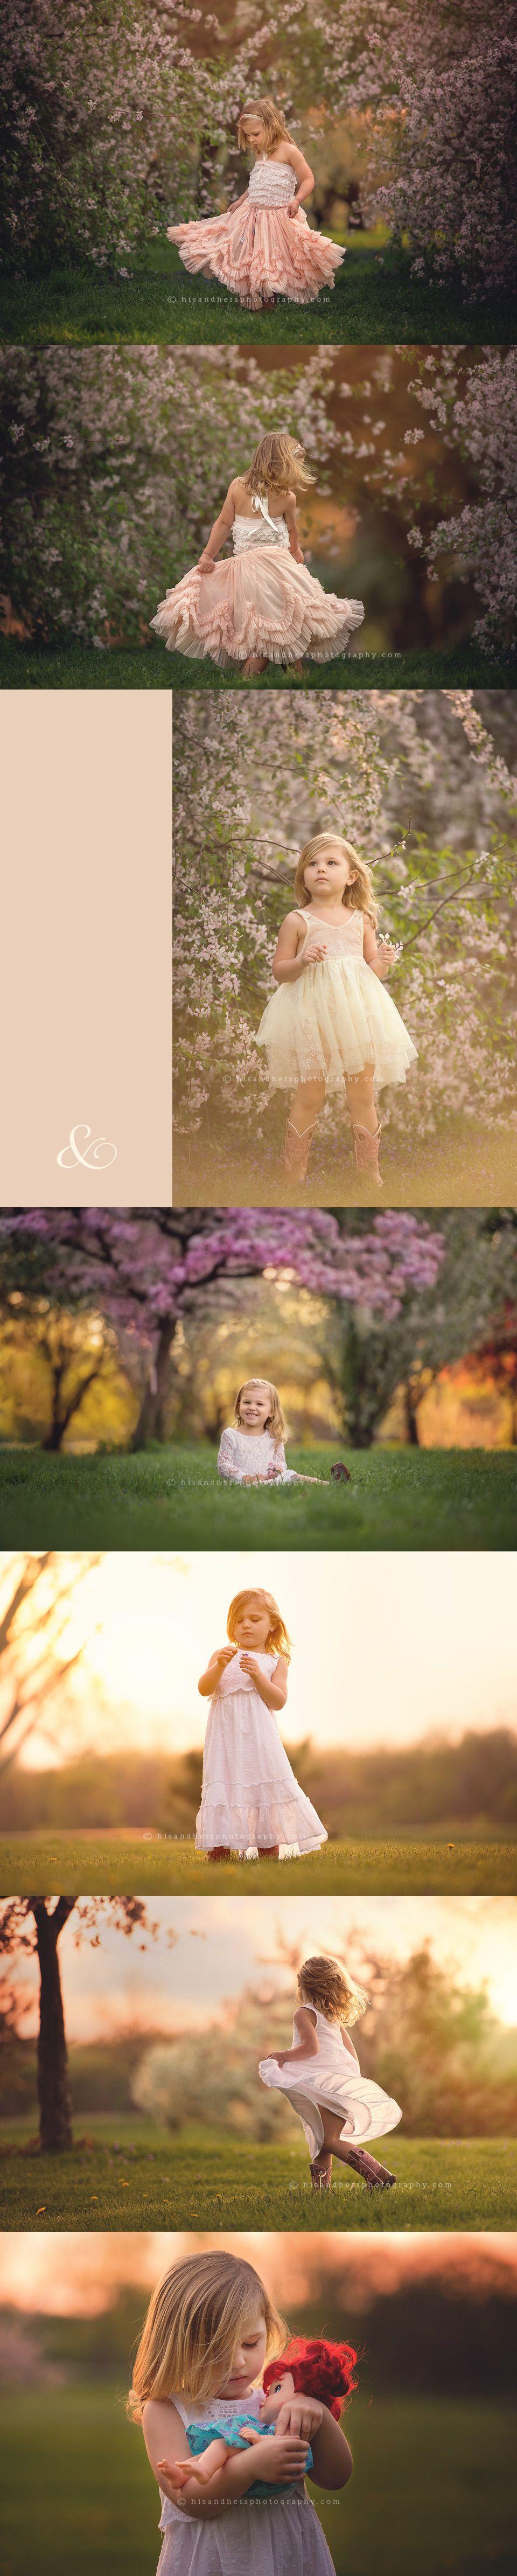 Child   Isadora, Spring Blooms